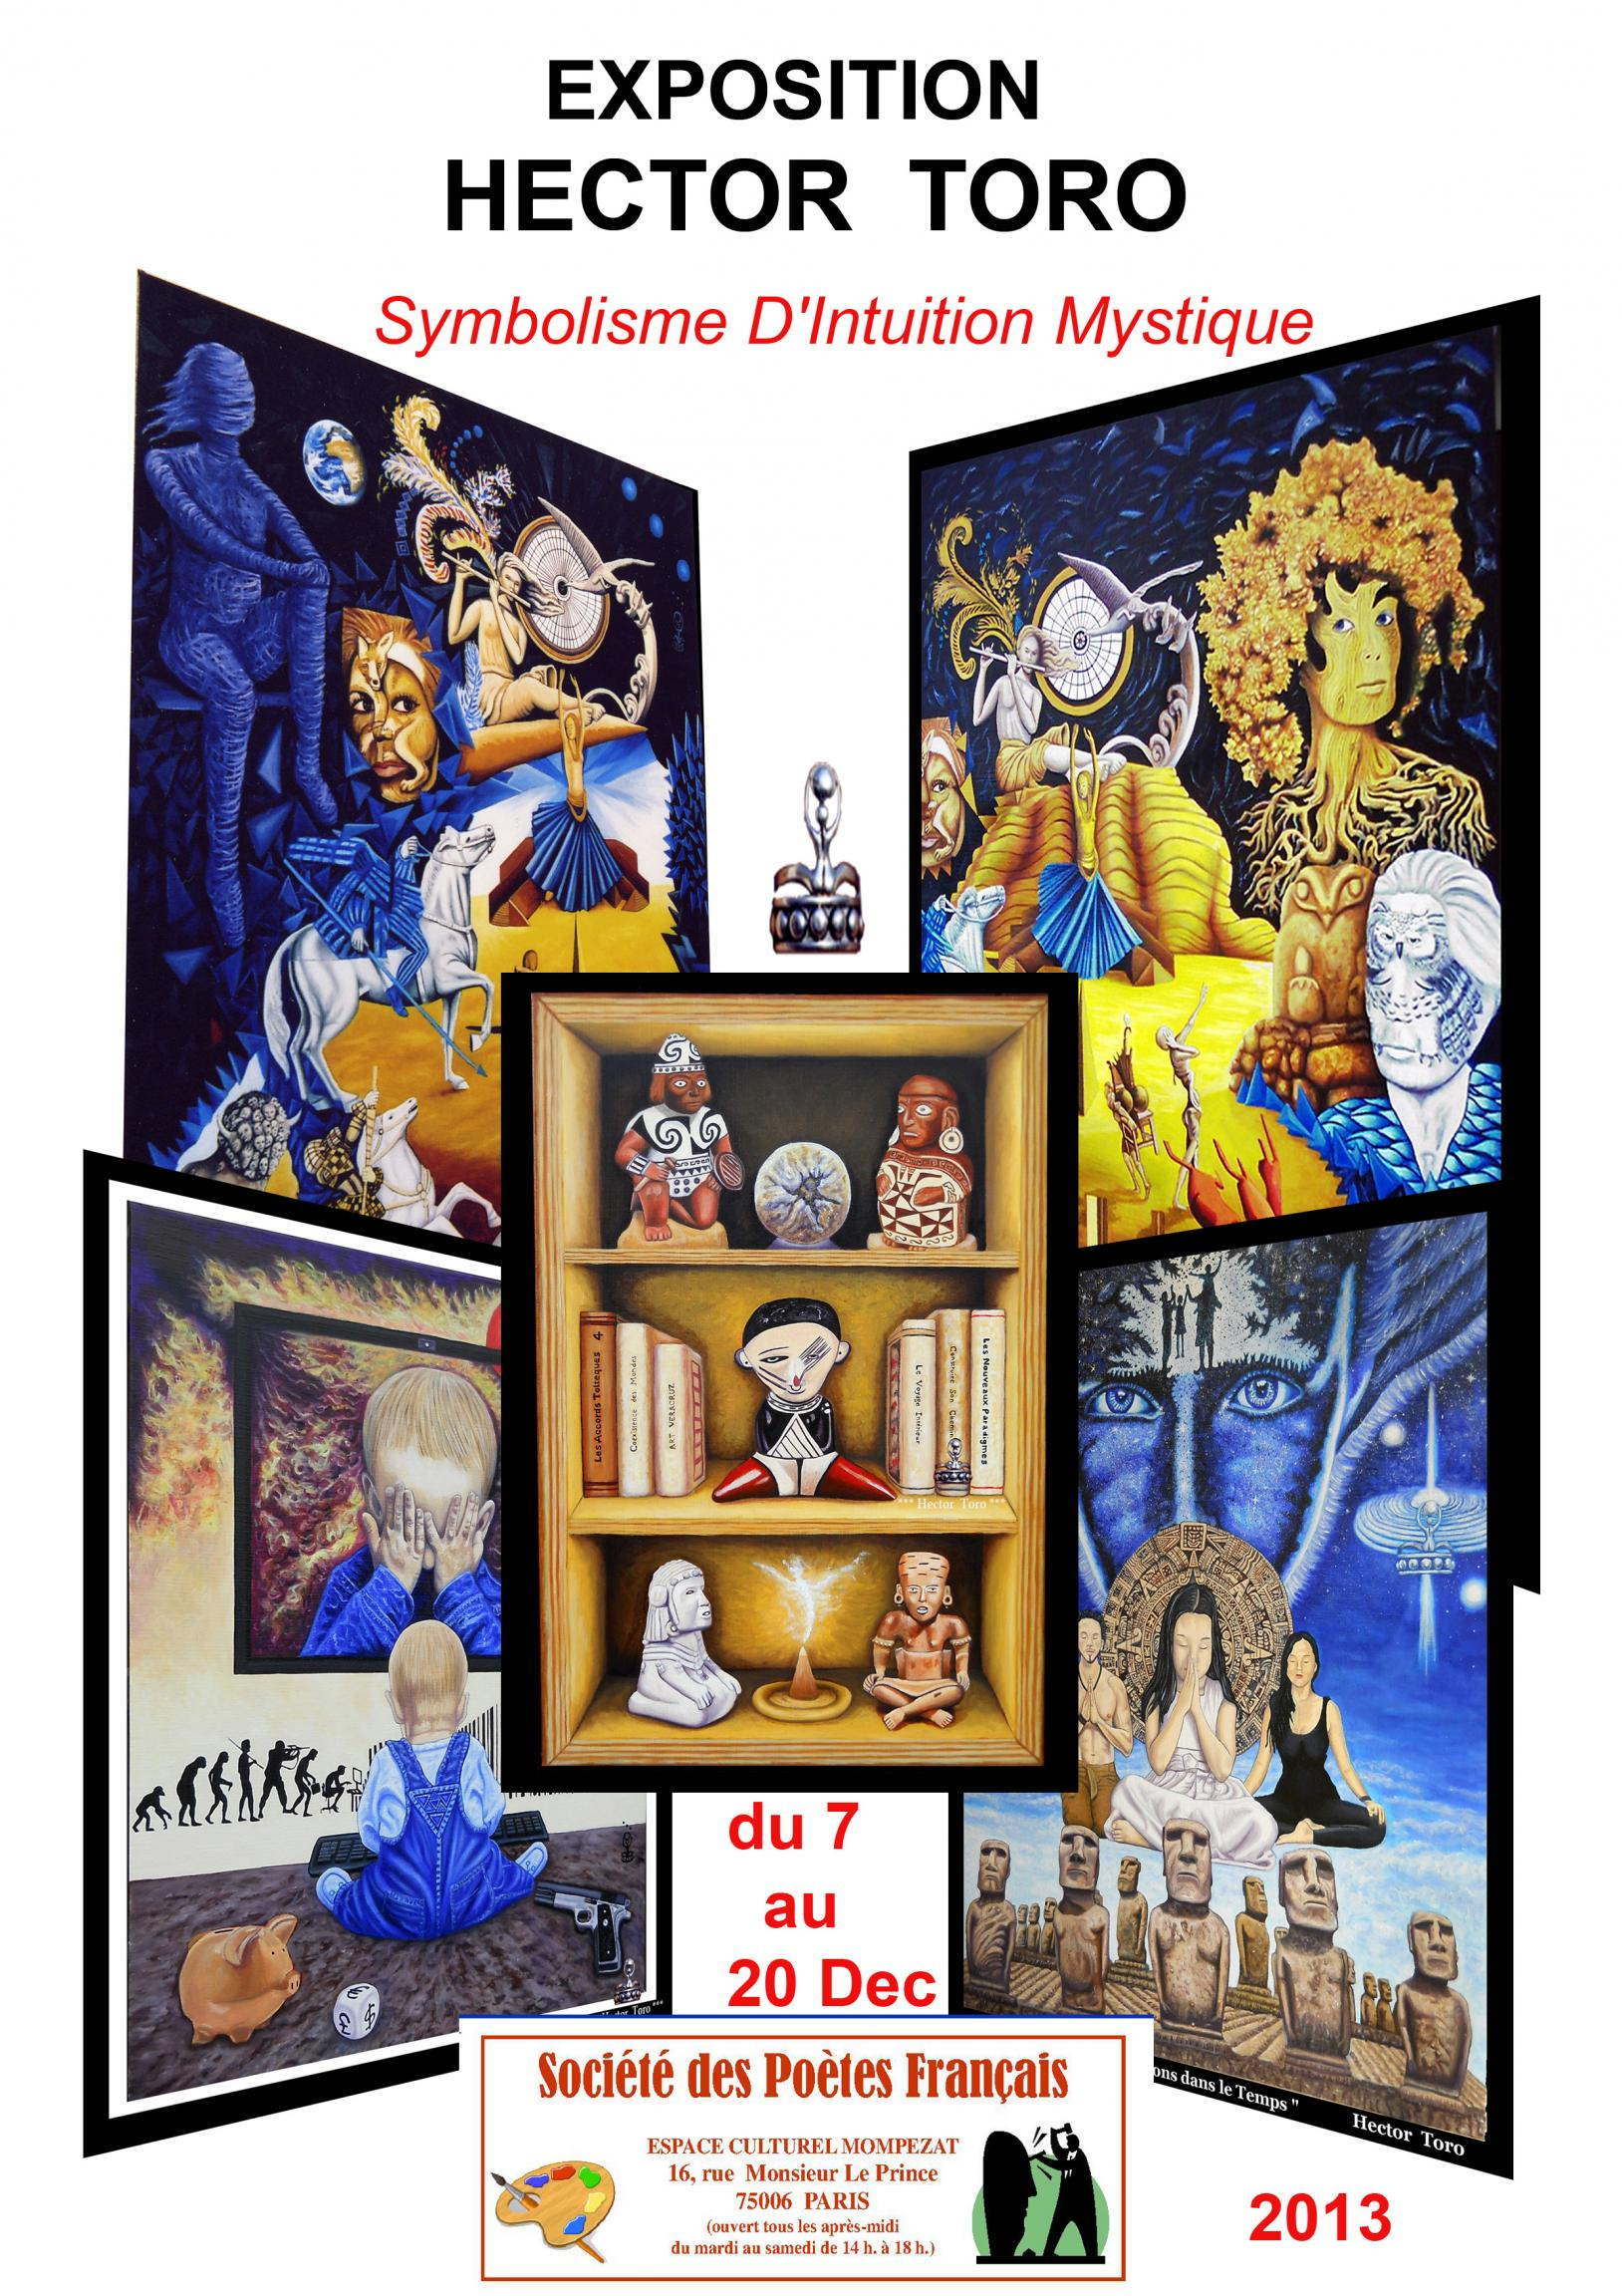 Actualité de Toro Hector ART Exposition de Hector Toro Symbolisme d'Intuition Mystique